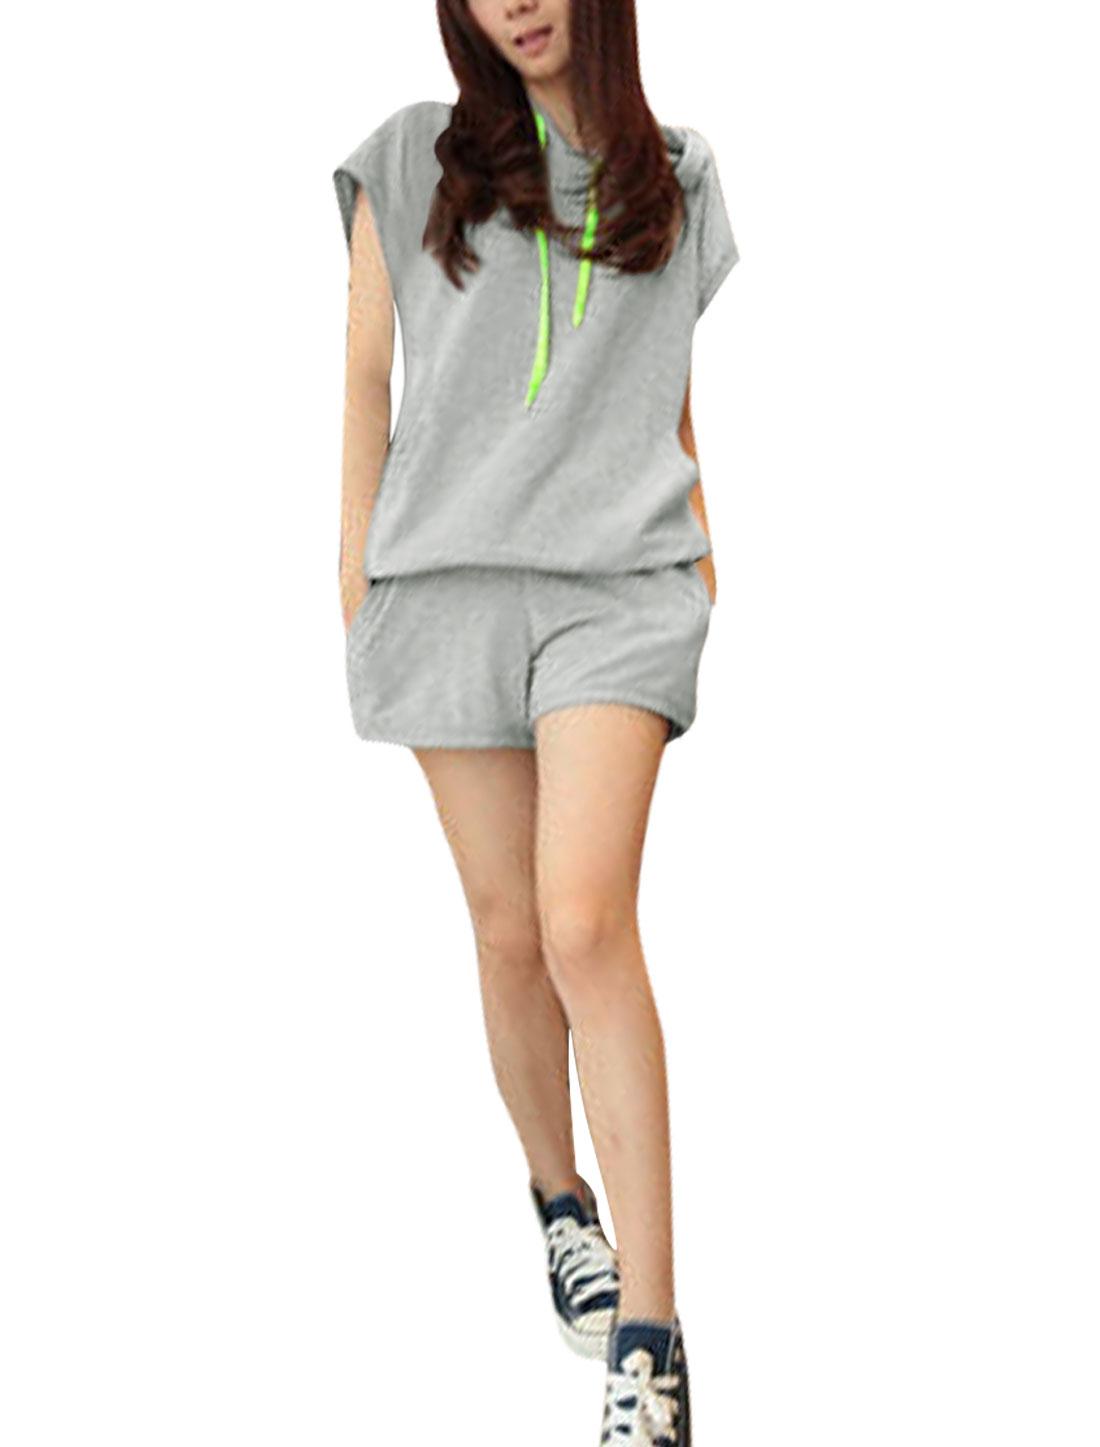 Women Stretchy Hem Short-sleeved Hoody w Pockets Shorts Gray XS